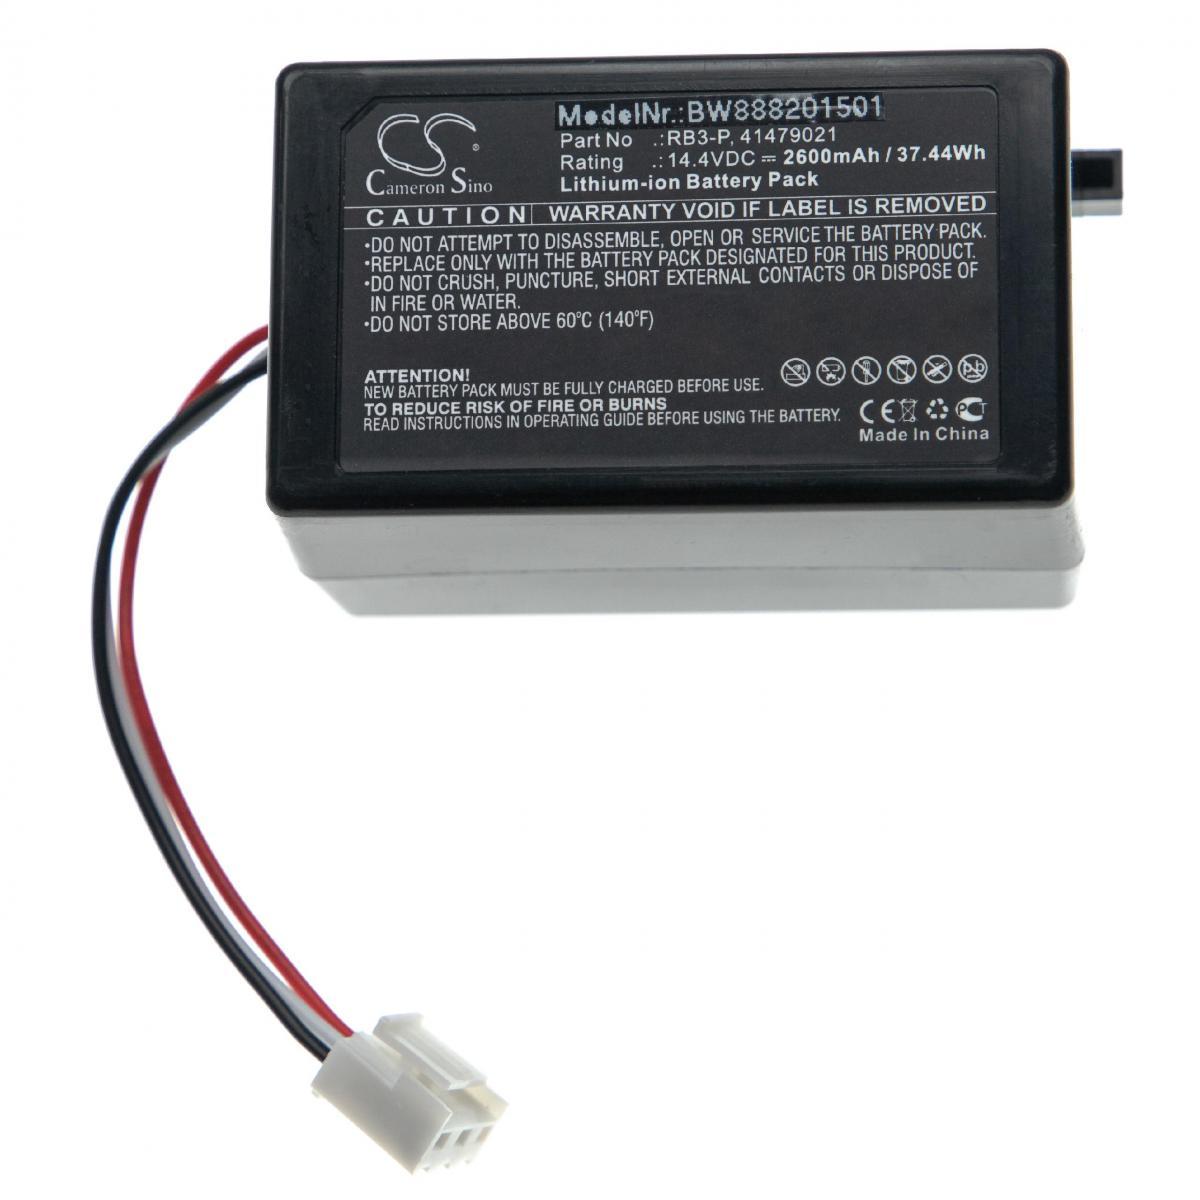 Vhbw vhbw batterie compatible avec Toshiba VC-RVS2 aspirateur Home Cleaner (2600mAh, 14,4V, Li-Ion)